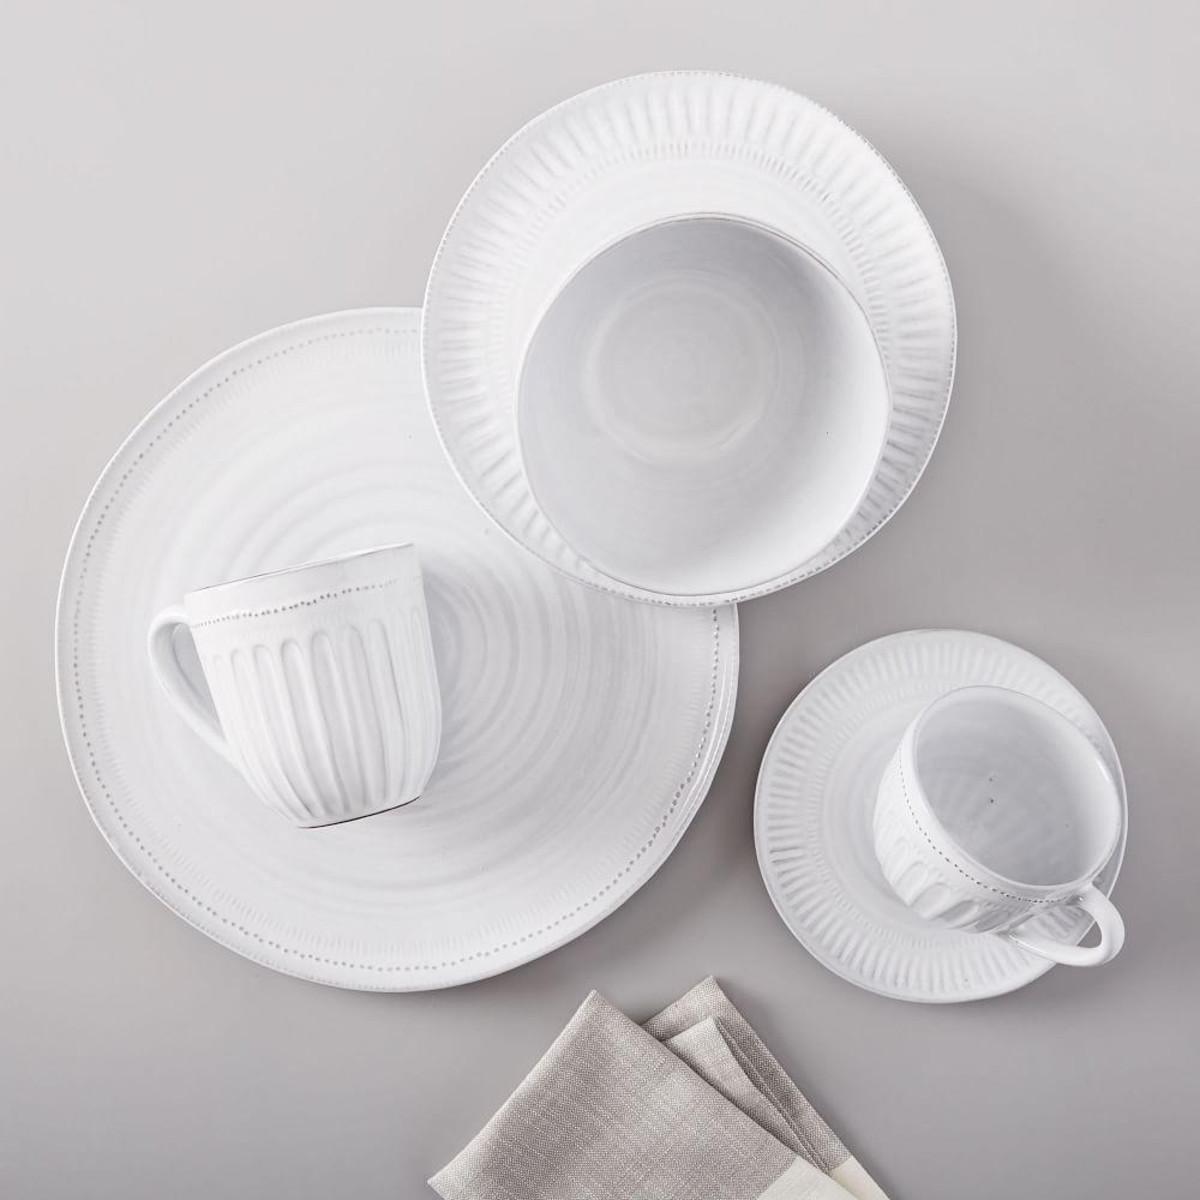 tin-glaze-dinnerware-set-of-4-d5041-alt3_imgz